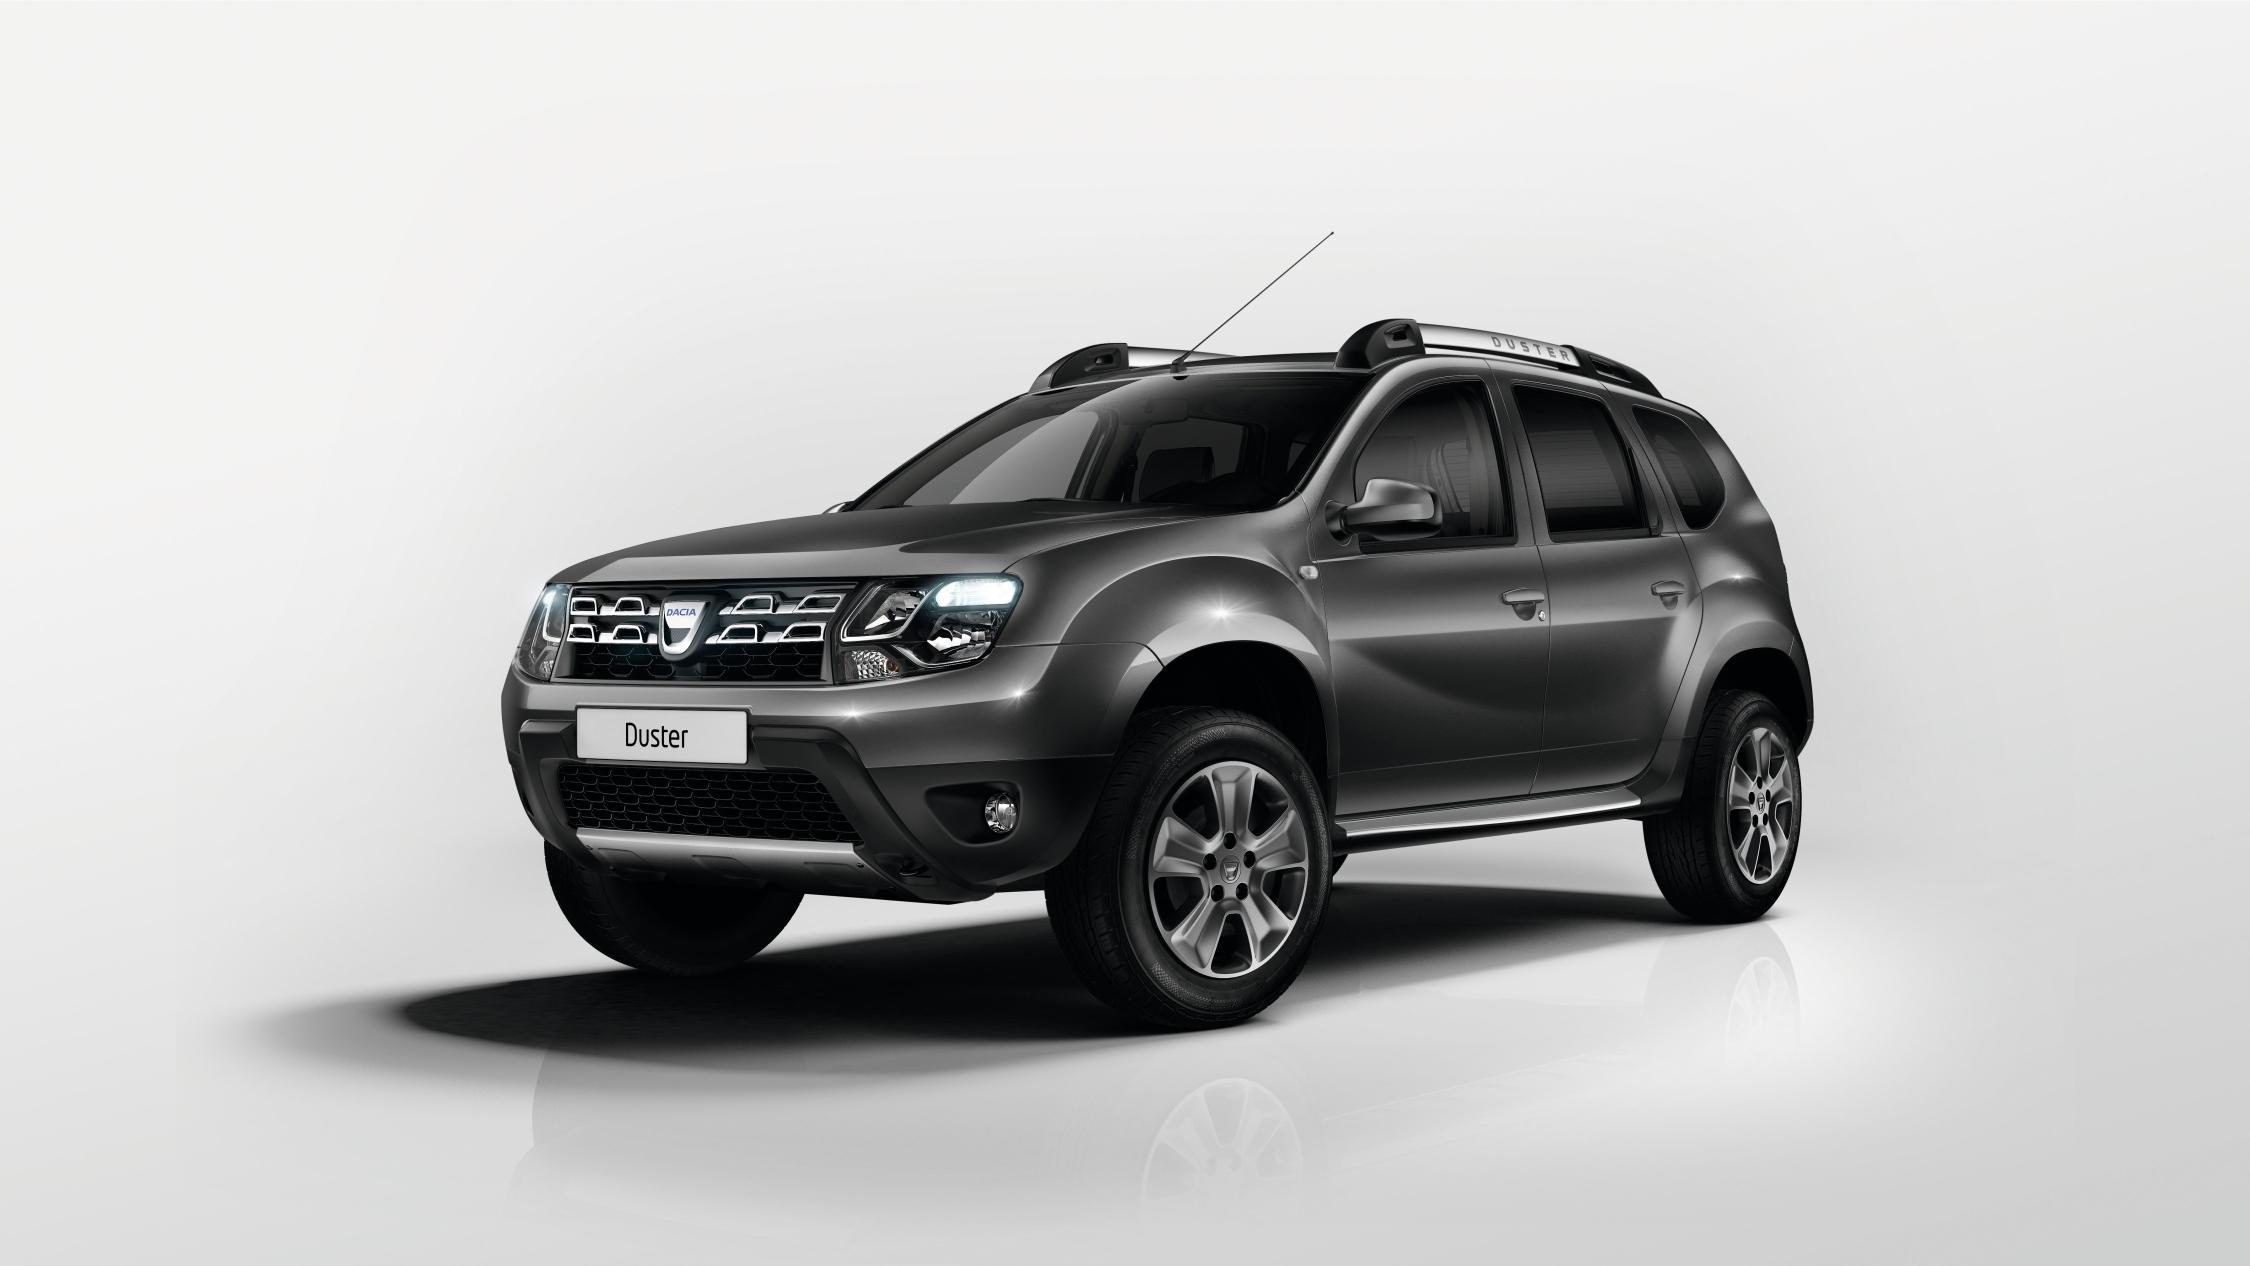 Dacia News At The 2016 Geneva Motor Show